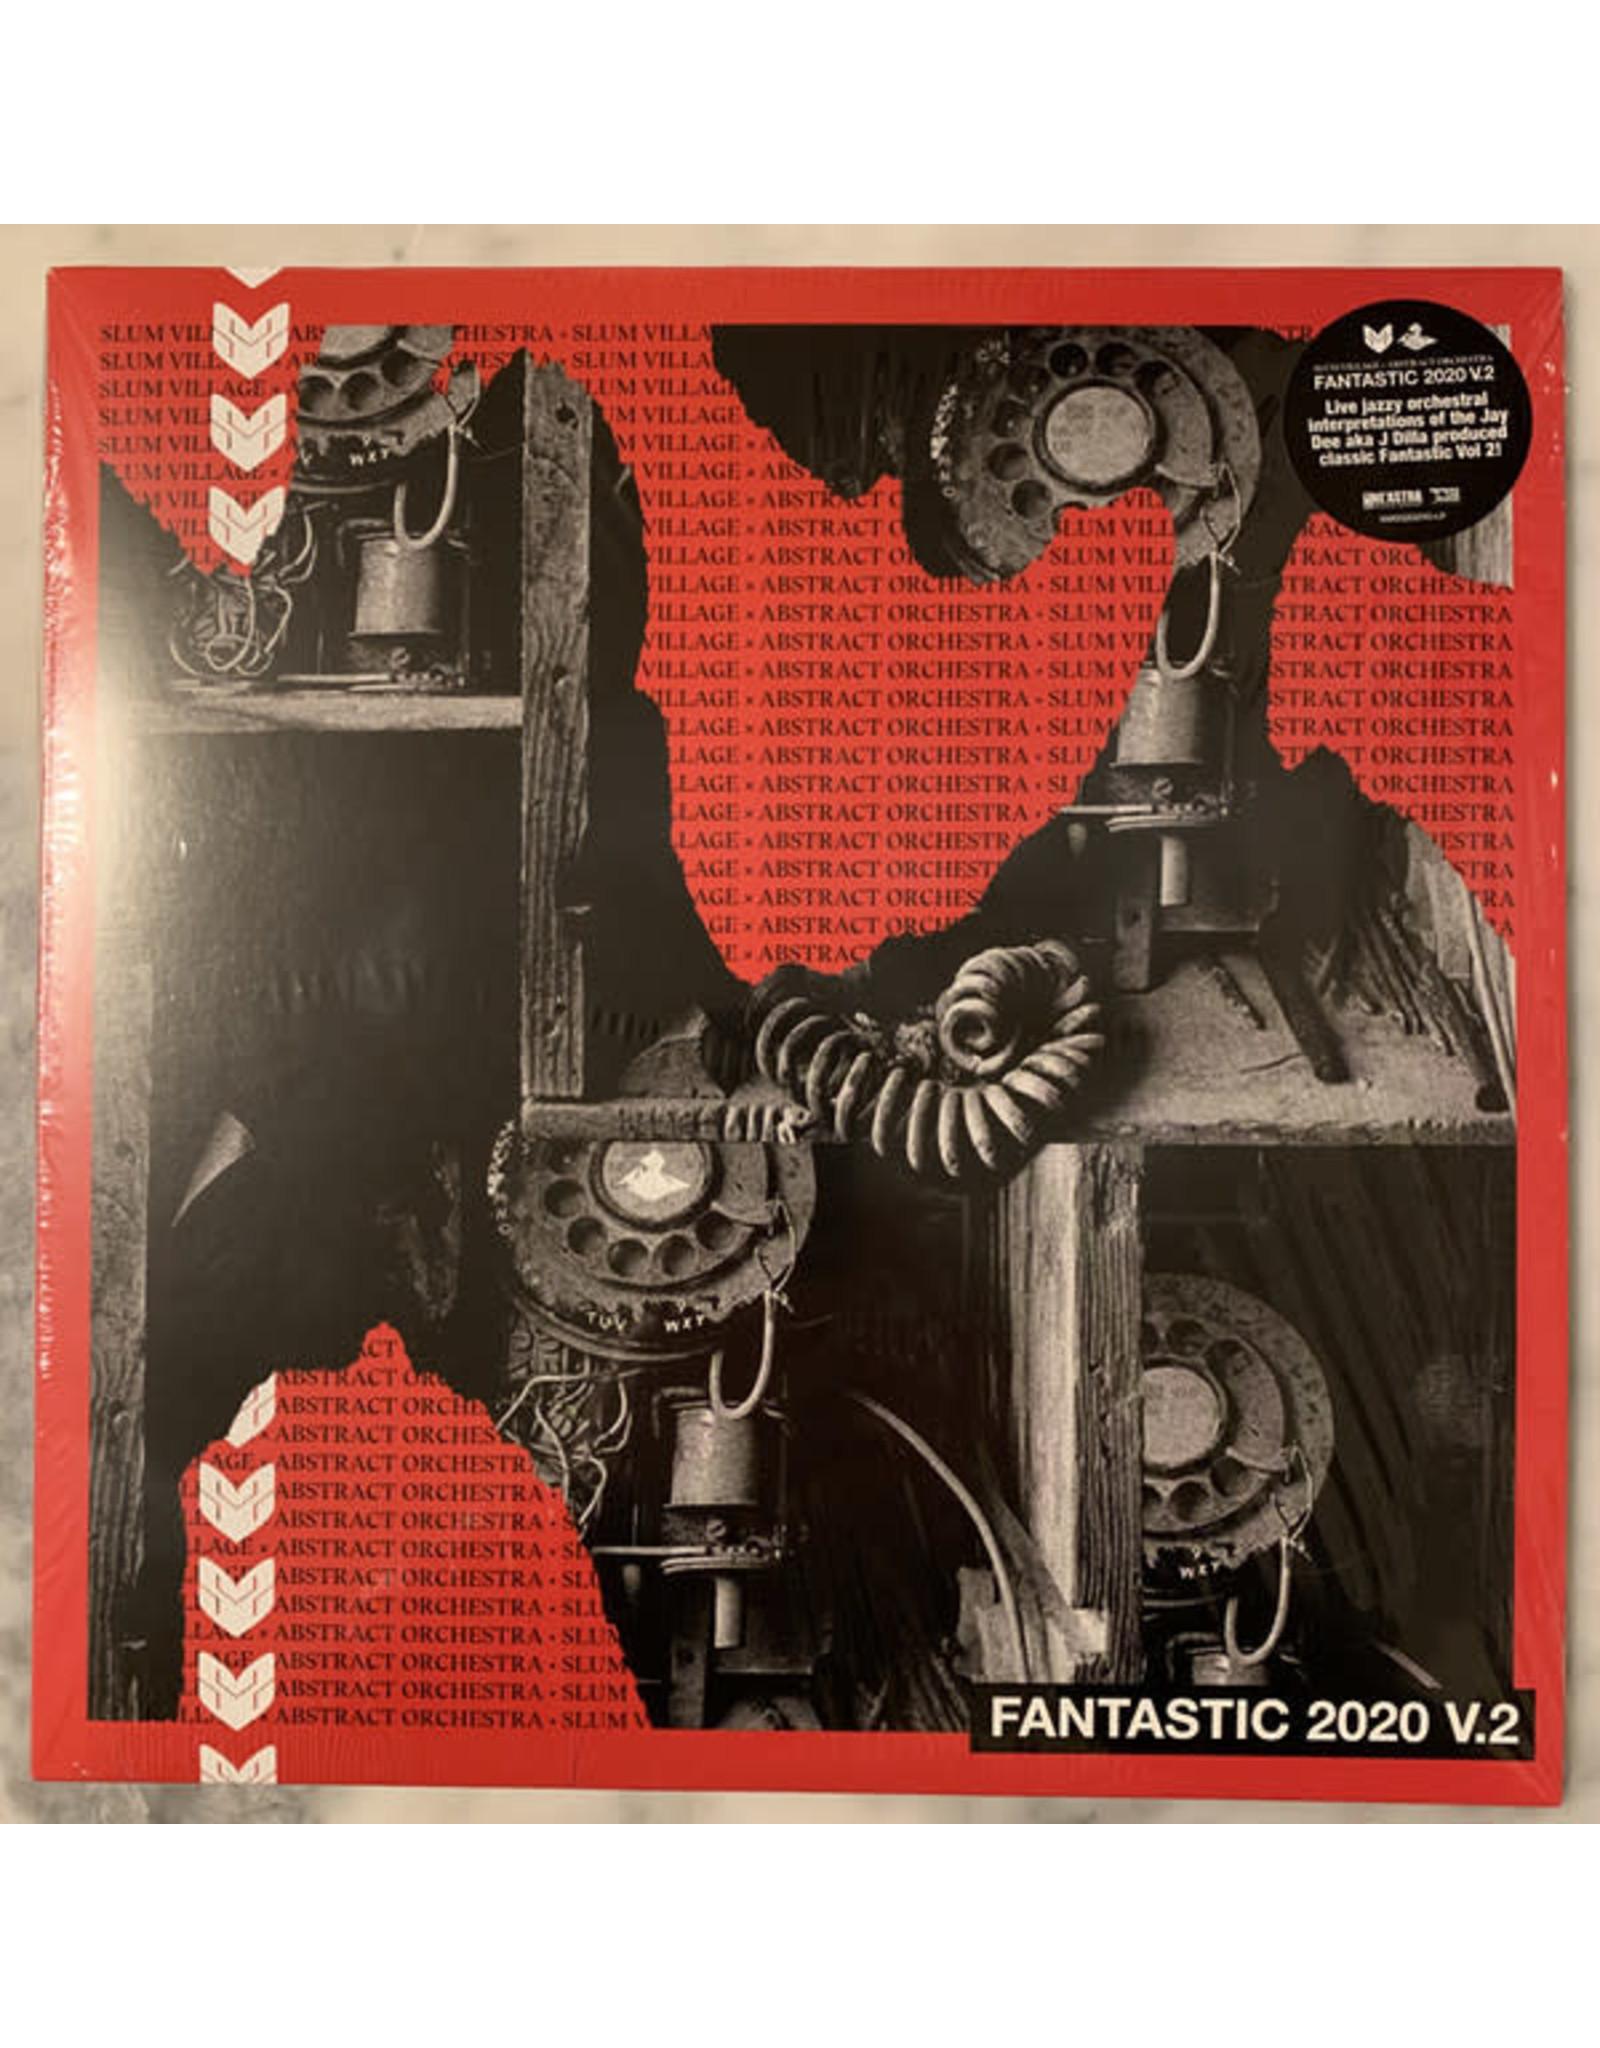 Abstract Orchestra - Fantastic 2020 V.2 LP